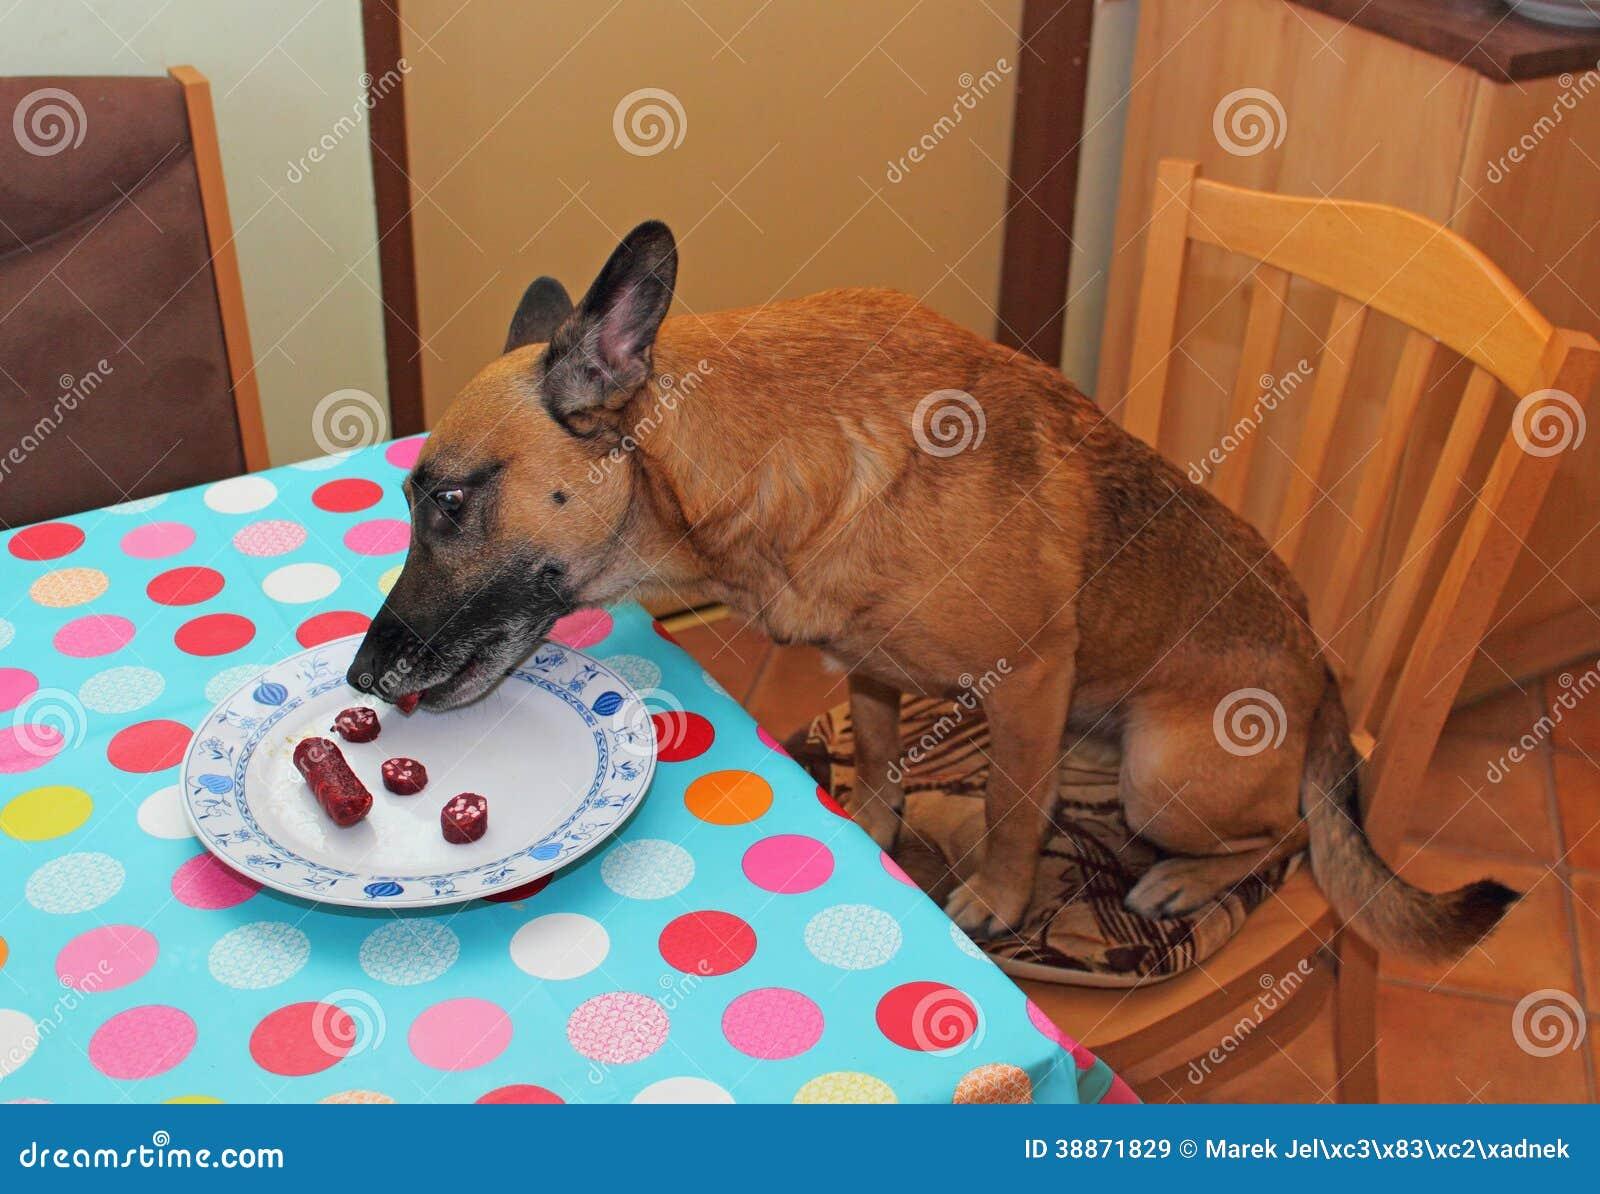 hund der wurst isst stockfoto bild 38871829. Black Bedroom Furniture Sets. Home Design Ideas